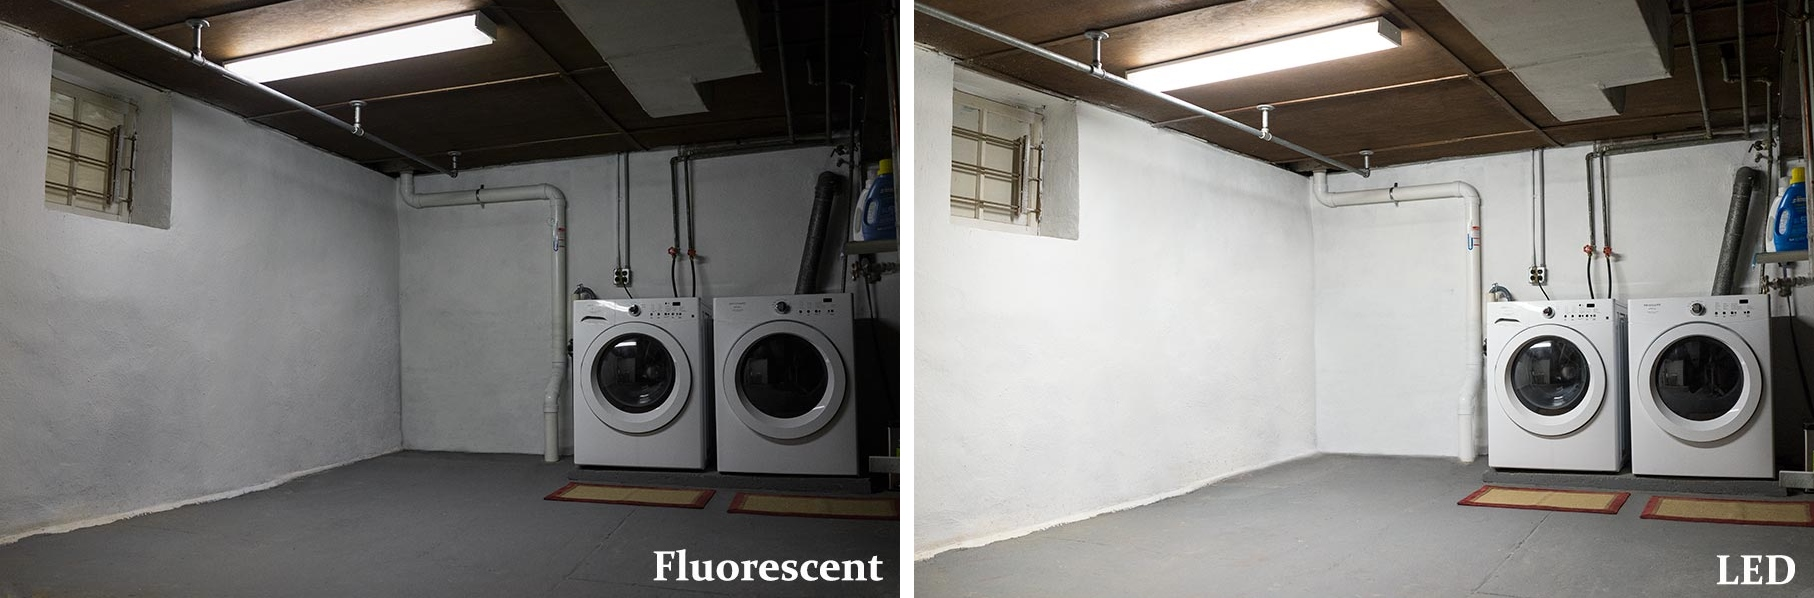 f32t8 LED T8 tube comparison against fluorescent